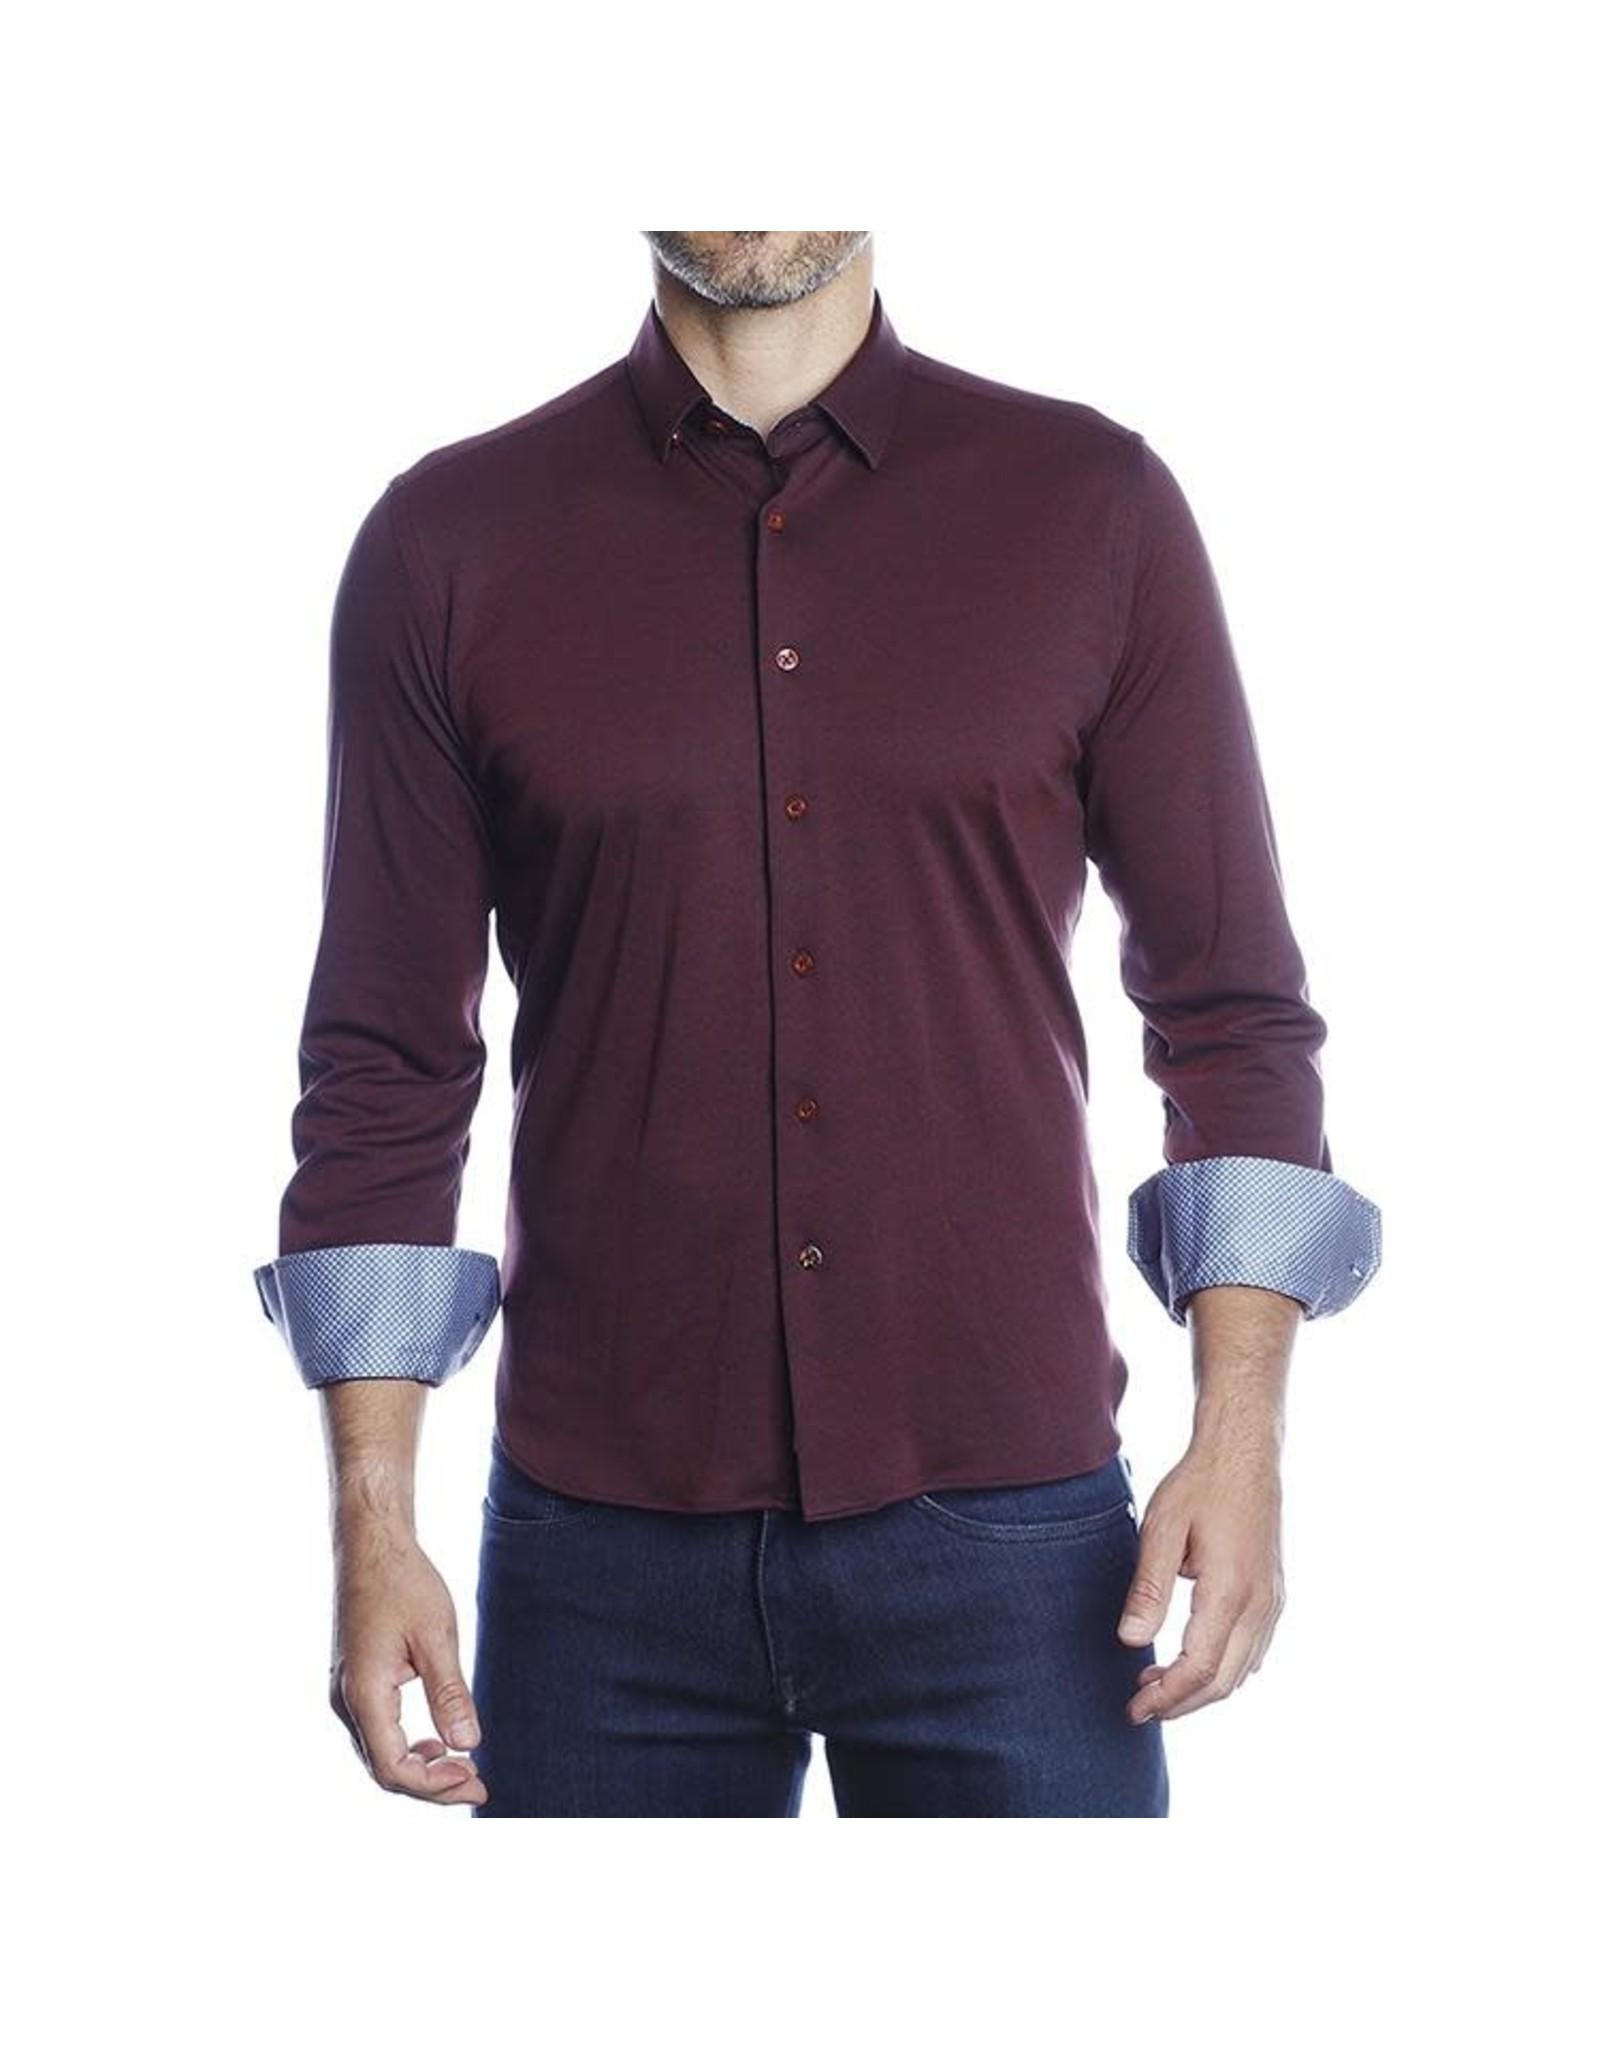 Luchiano Visconti 4318 Global Mint Shirt